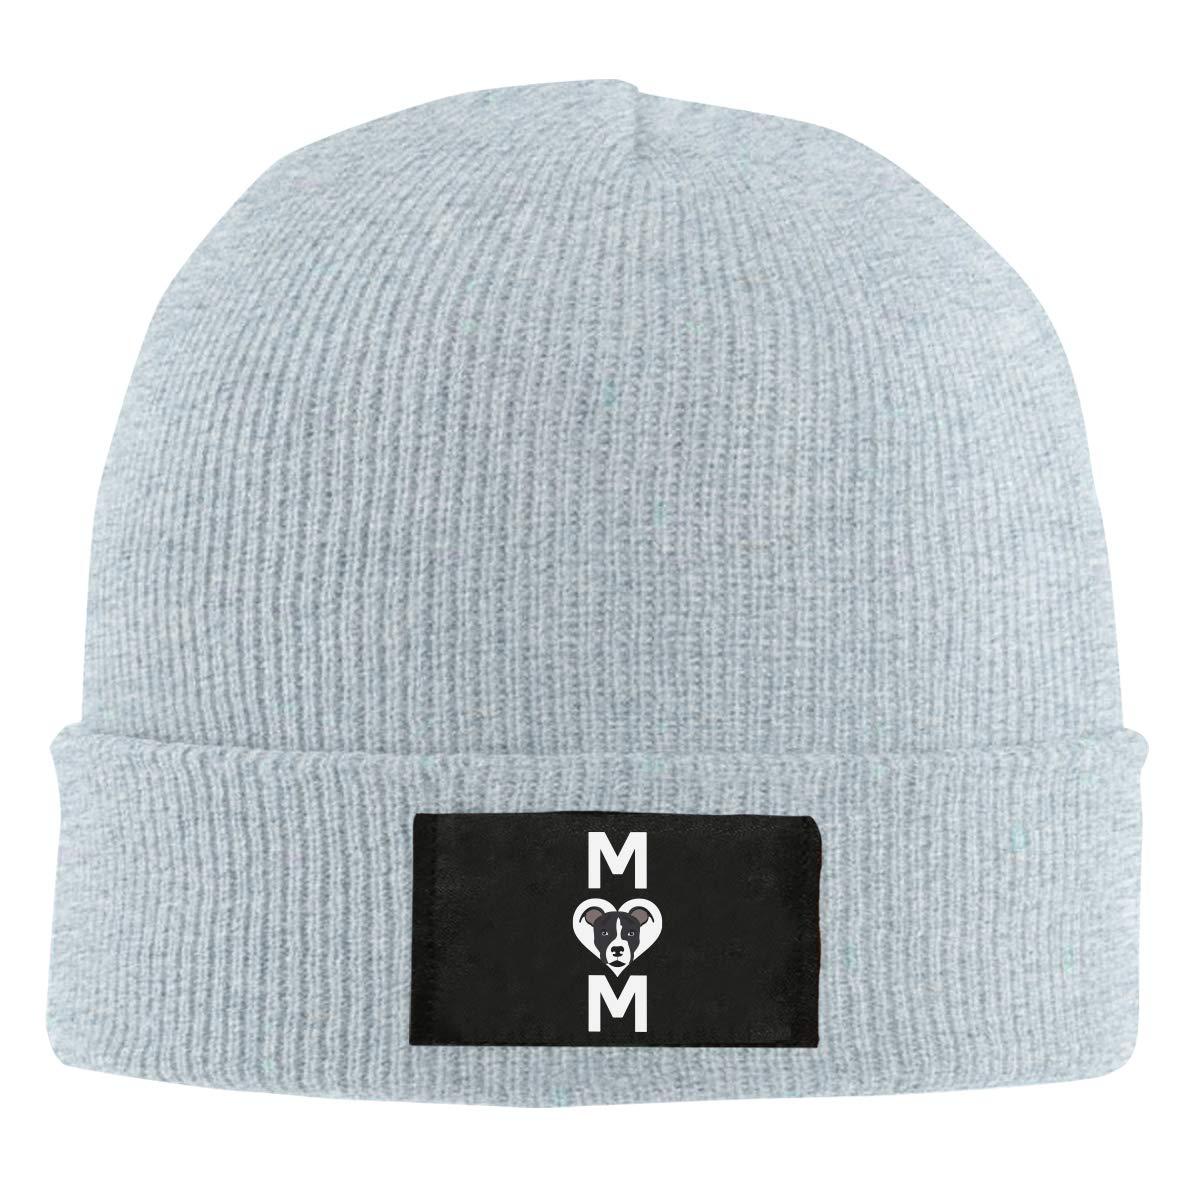 Pitbull Mom Women and Men Knitted Hat Winter Warm Skull Cap